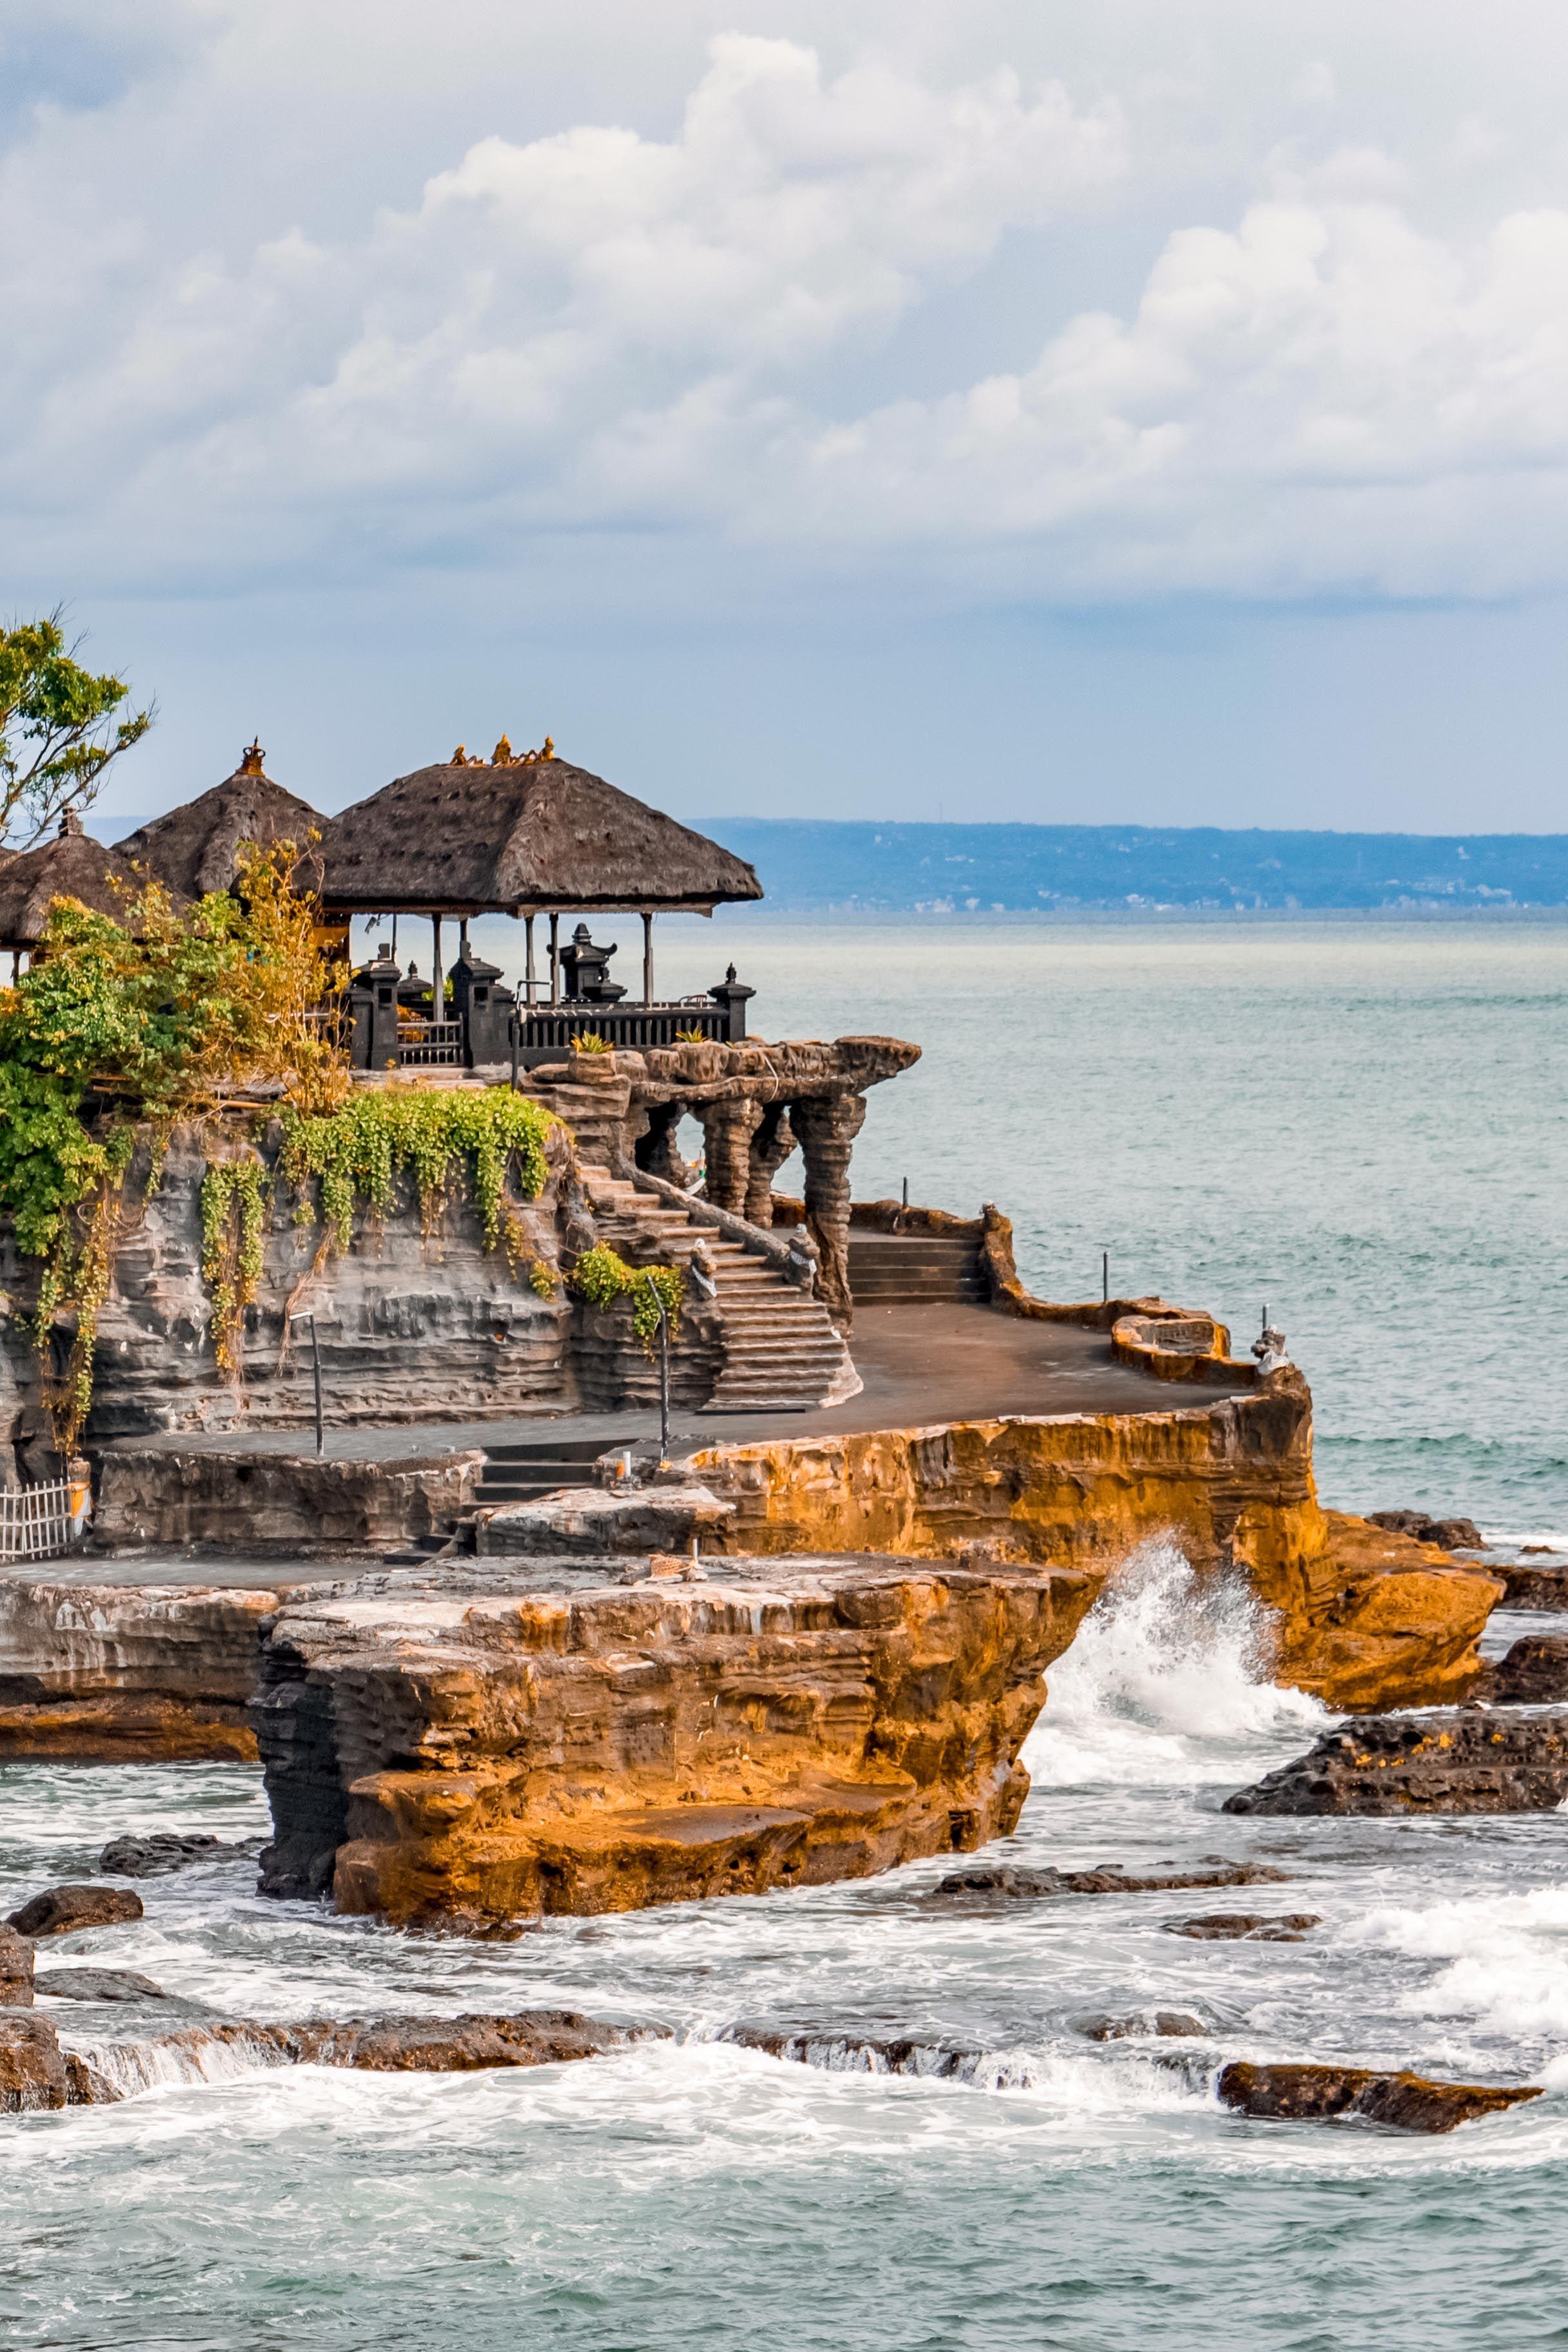 Pin oleh Nicole Allen di Bucket List di 2020 Tanah, Bali